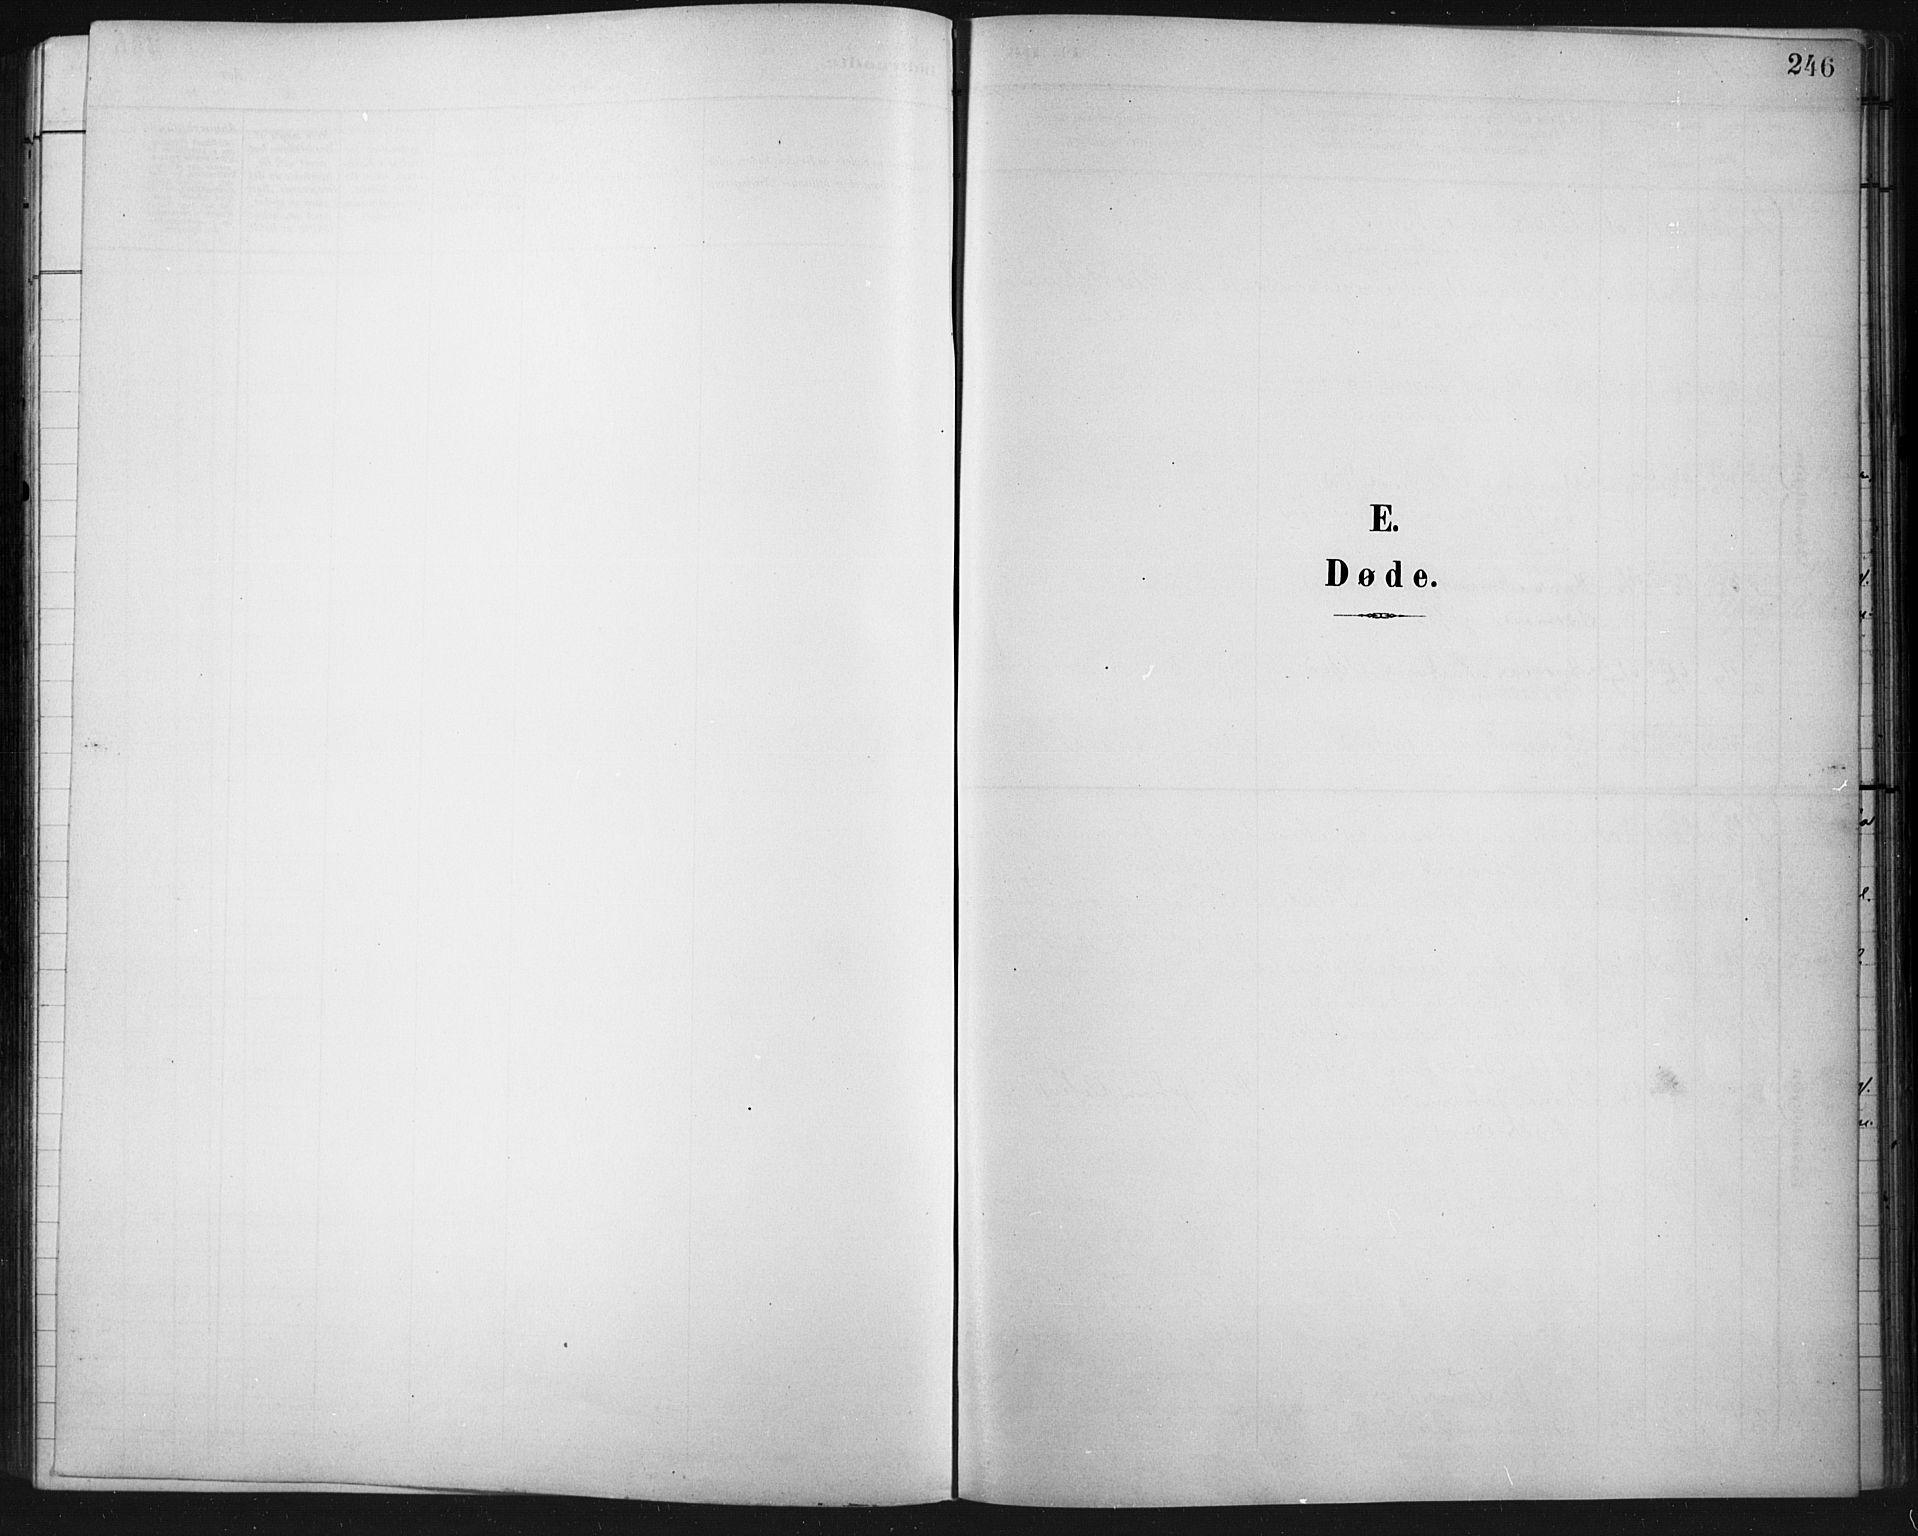 SAH, Fåberg prestekontor, Klokkerbok nr. 11, 1901-1921, s. 246